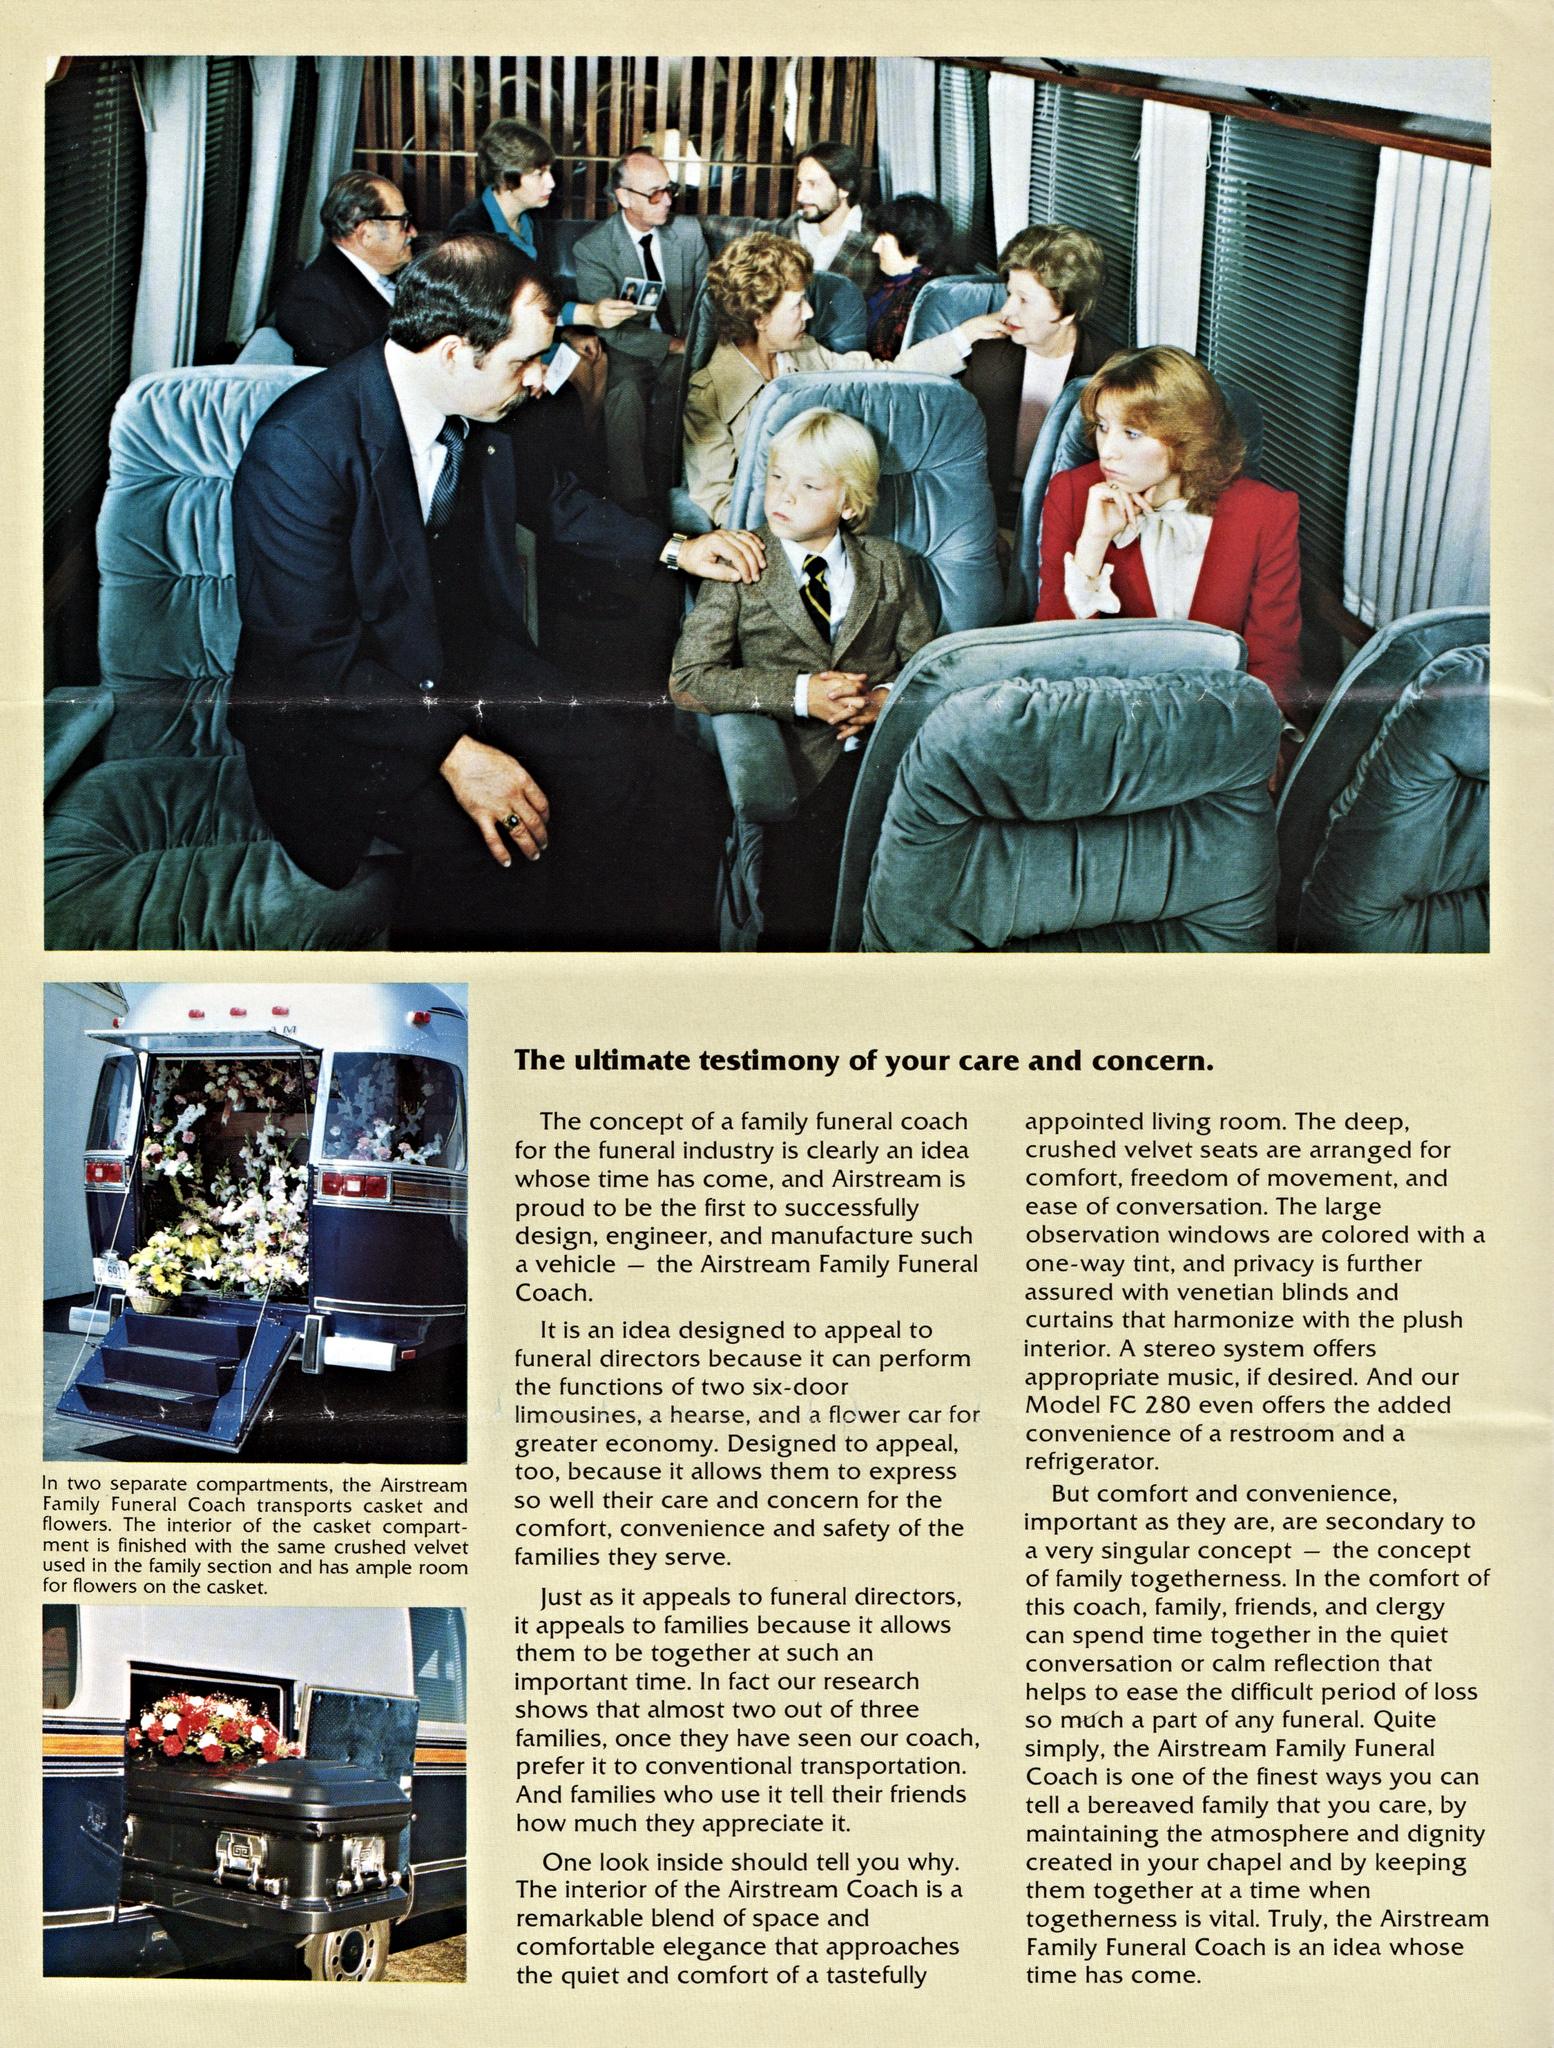 Airstream Funeral Coach